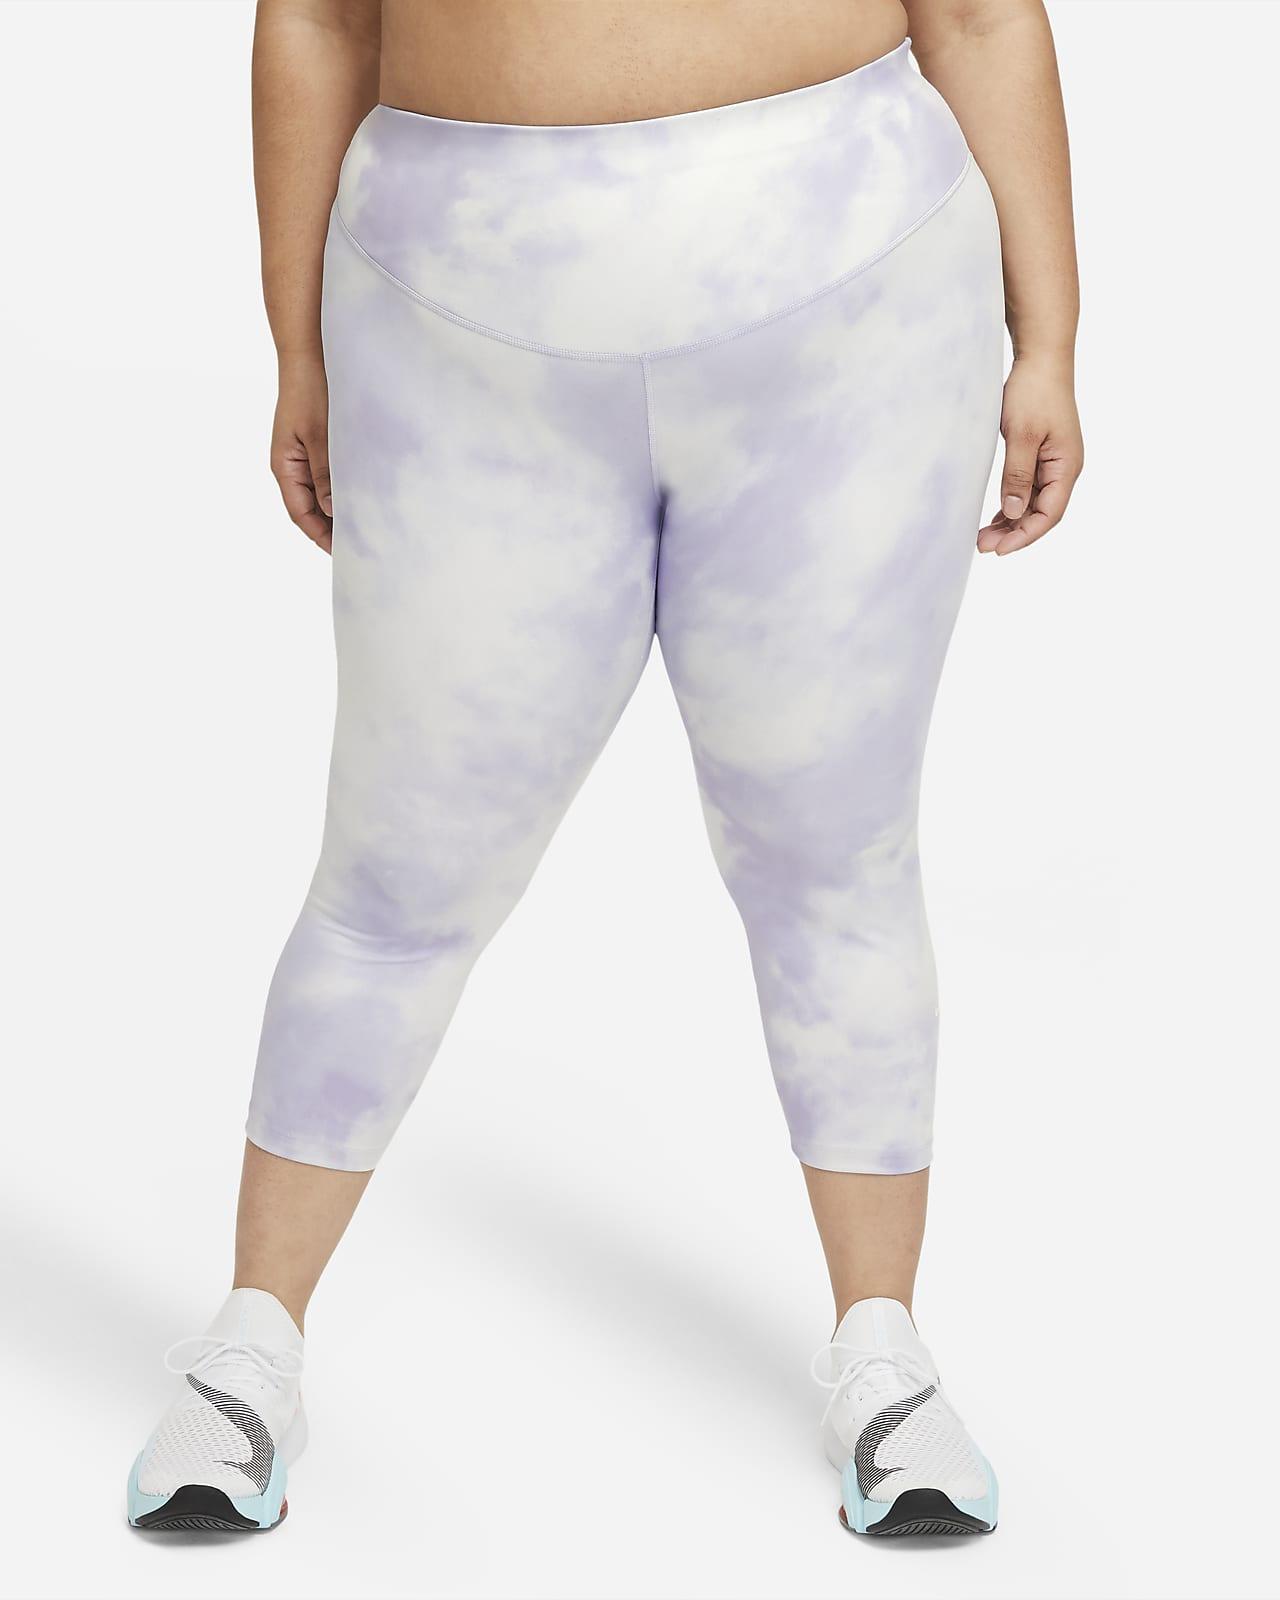 Legging court taille mi-haute Nike One Icon Clash pour Femme (Grande taille)